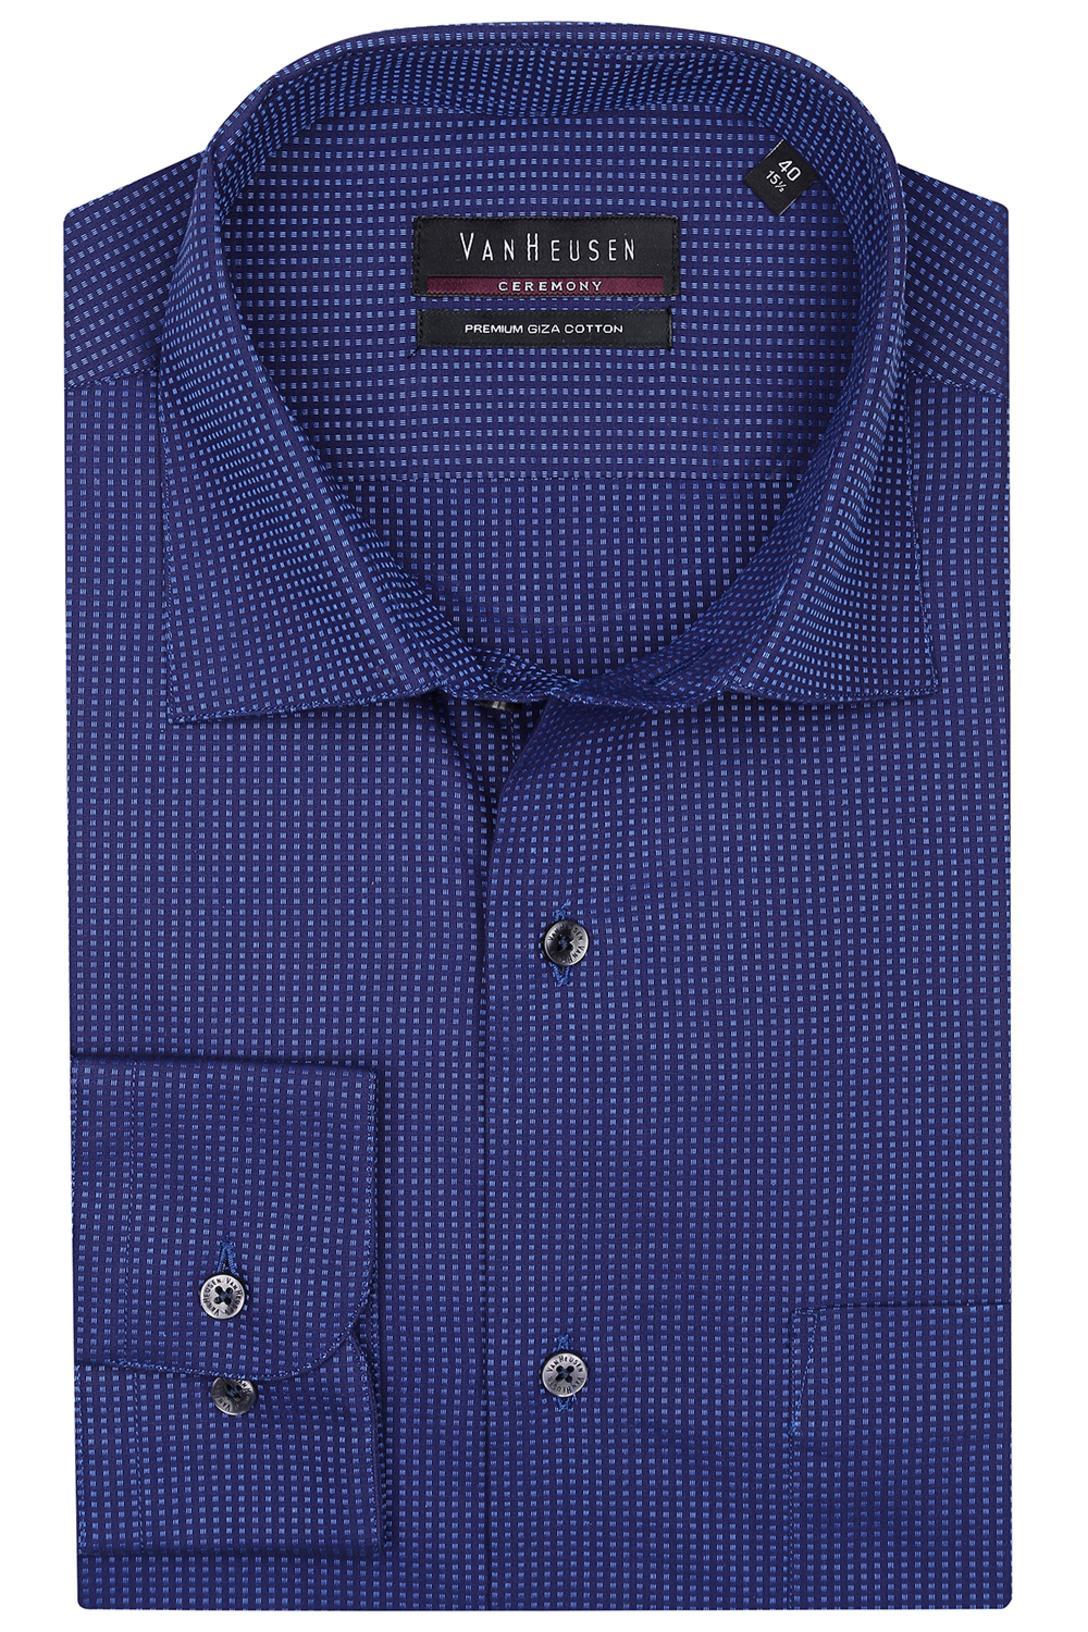 78104e87 Buy VAN HEUSEN Van Heusen-Mens Full Sleeves Custom Fit Formal Check Shirt |  Shoppers Stop